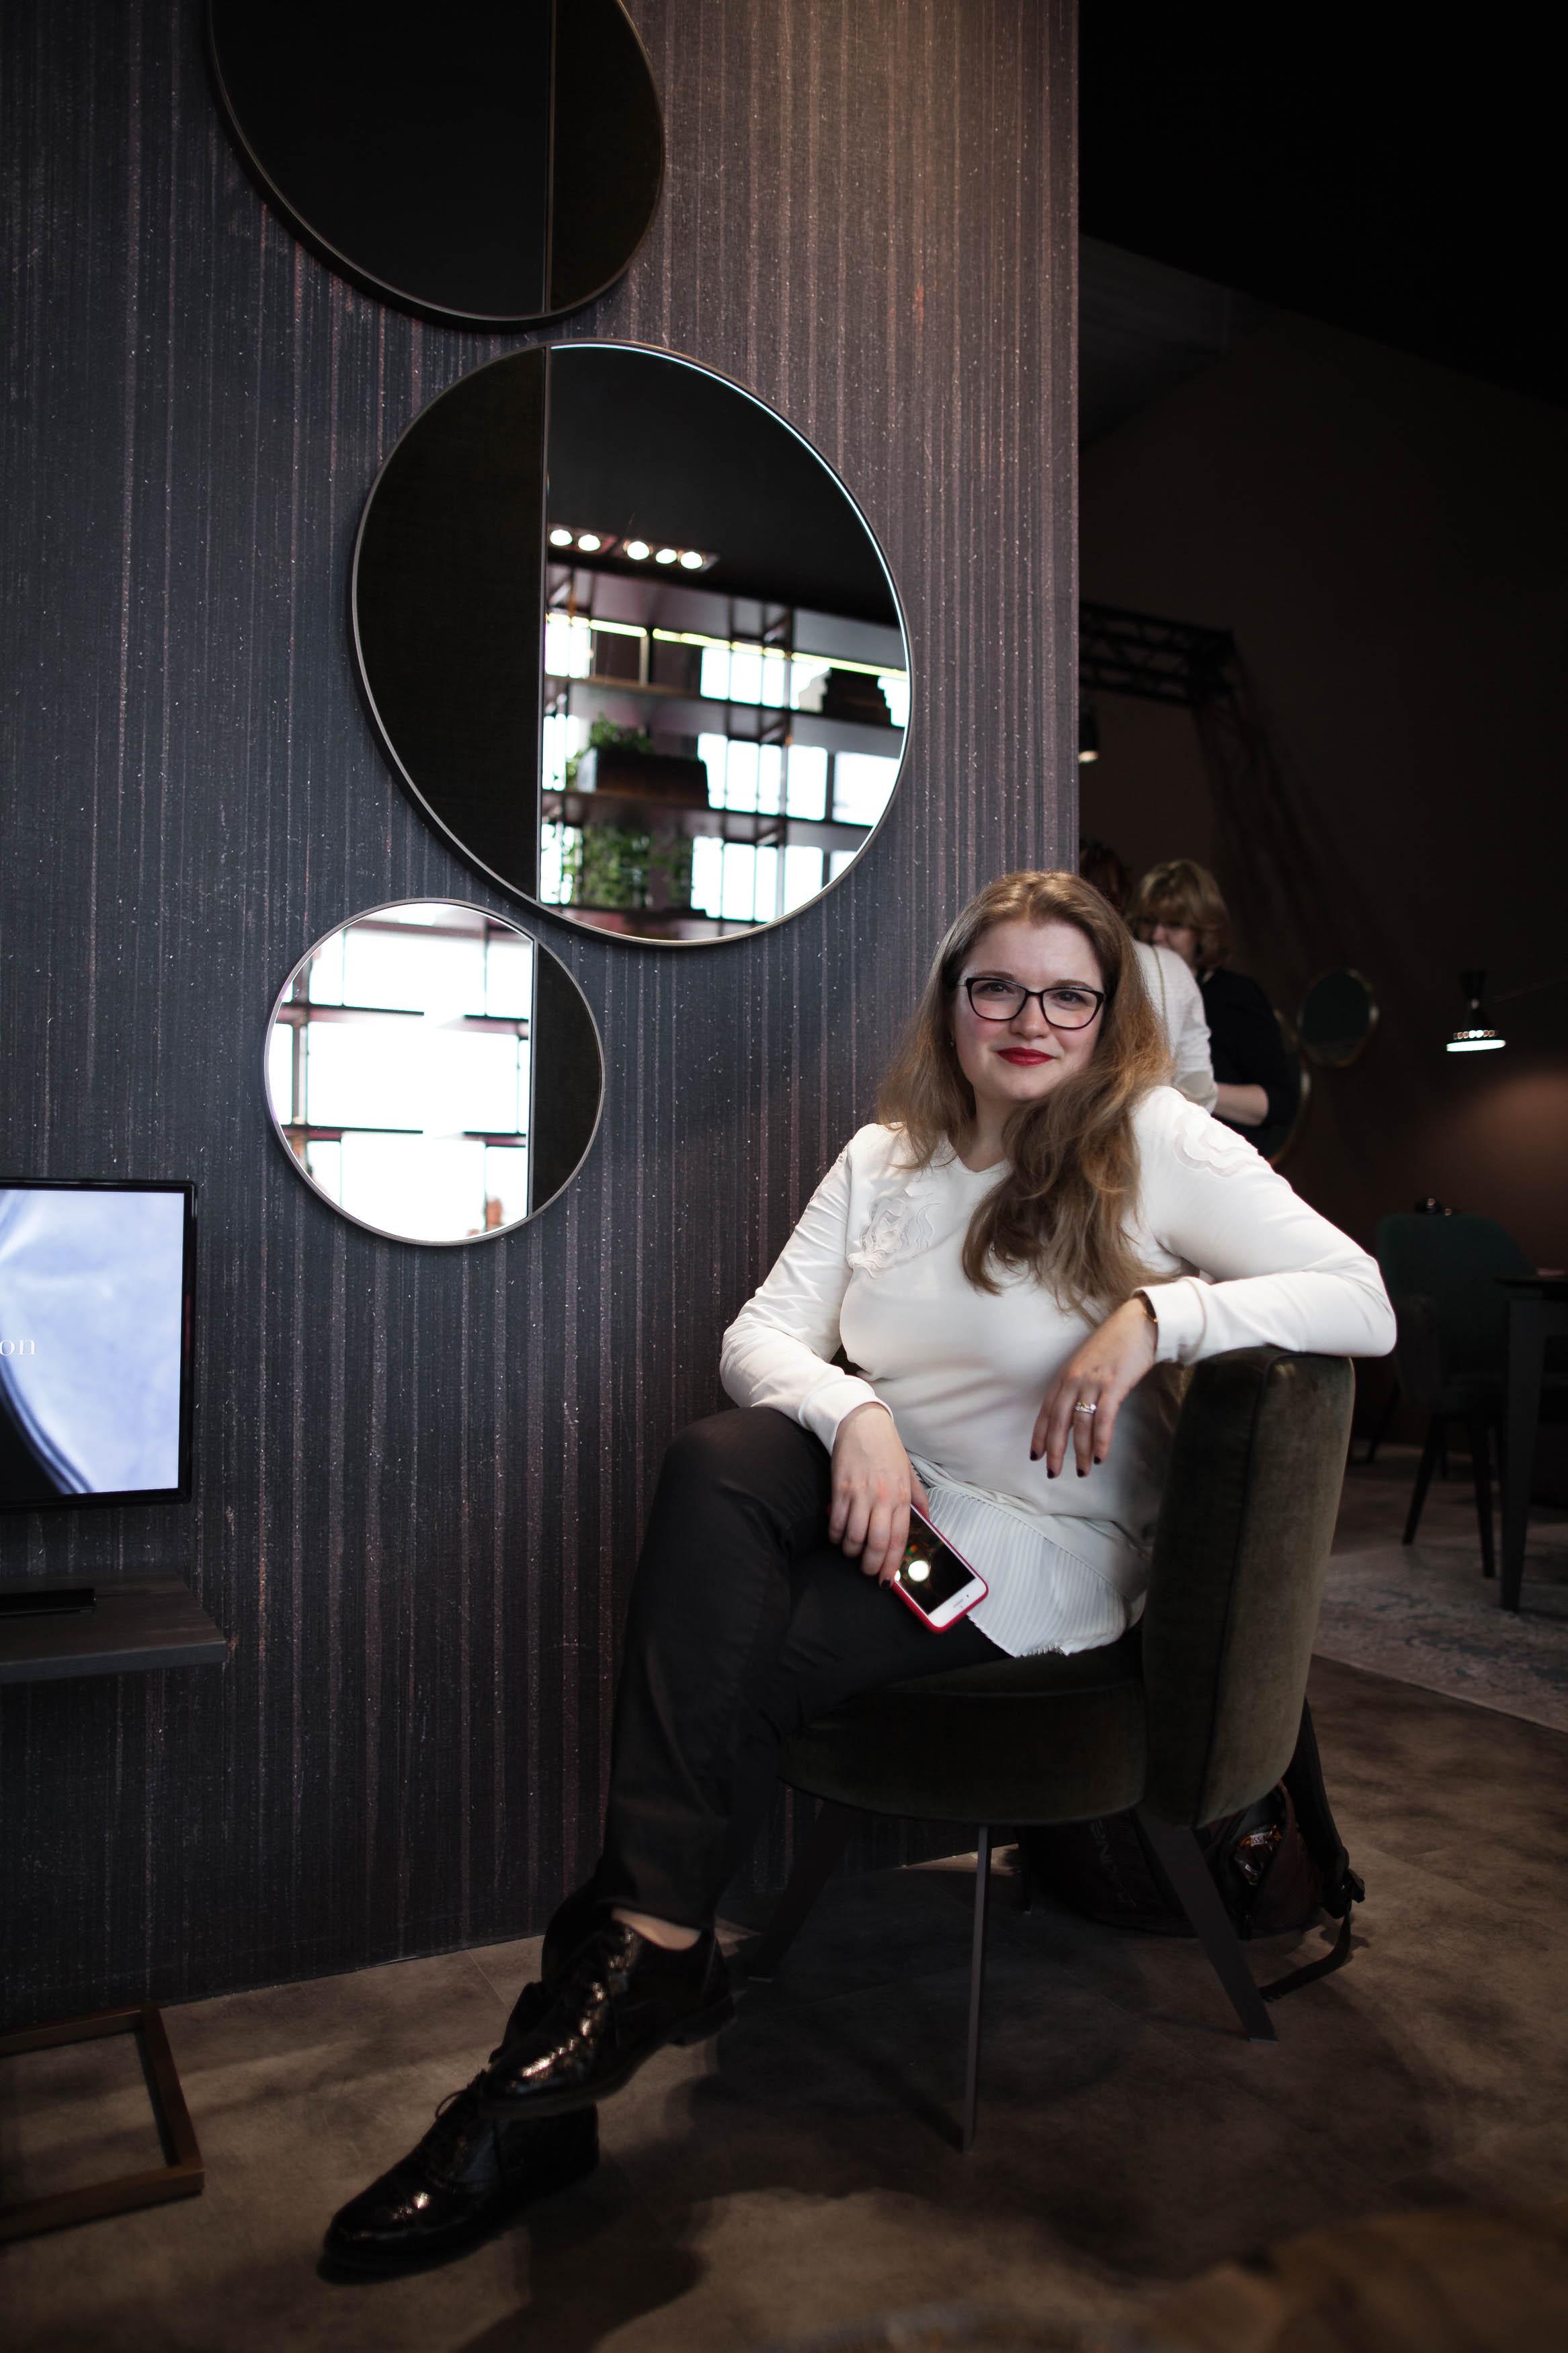 MSH at Salone - Borzalino half moon mirrors - Masha Shapiro Agency UK.jpg